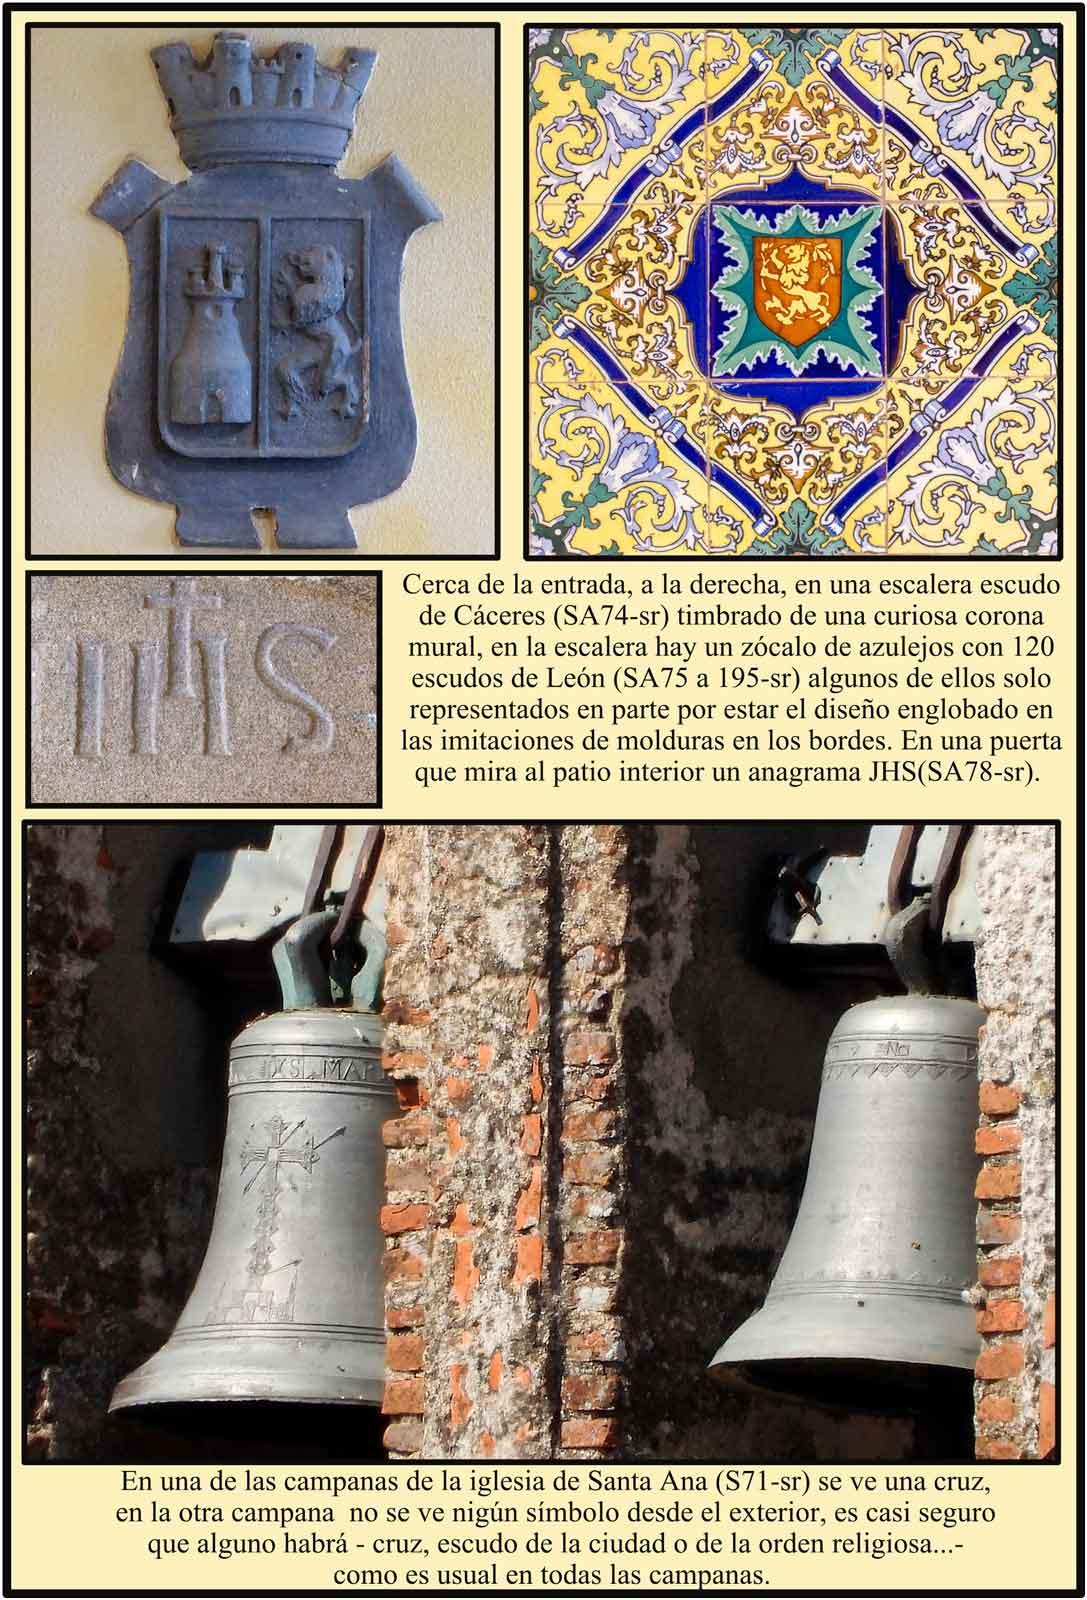 Plasencia Jesuitas campanas de Santa Ana Escudo de Caceres Leon